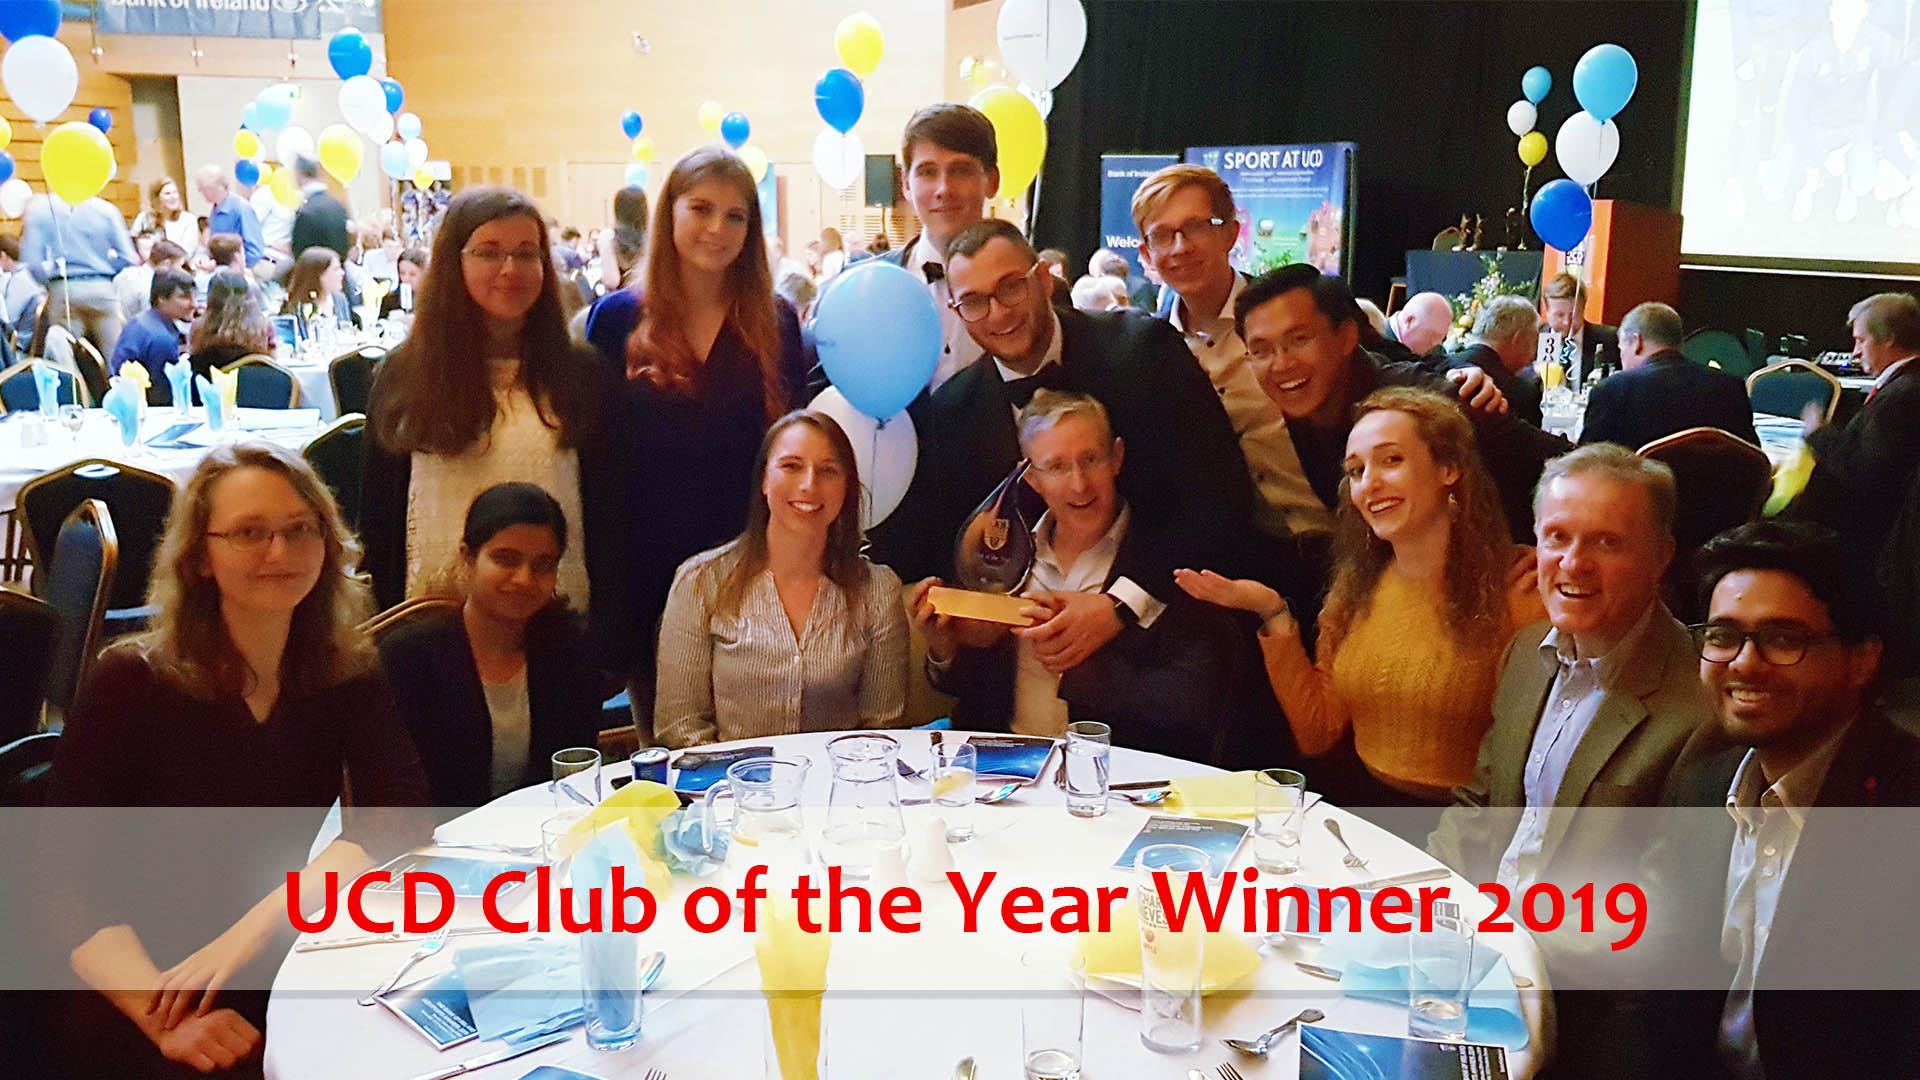 UCD Club of the Year Winner 2019 - UCD Karate